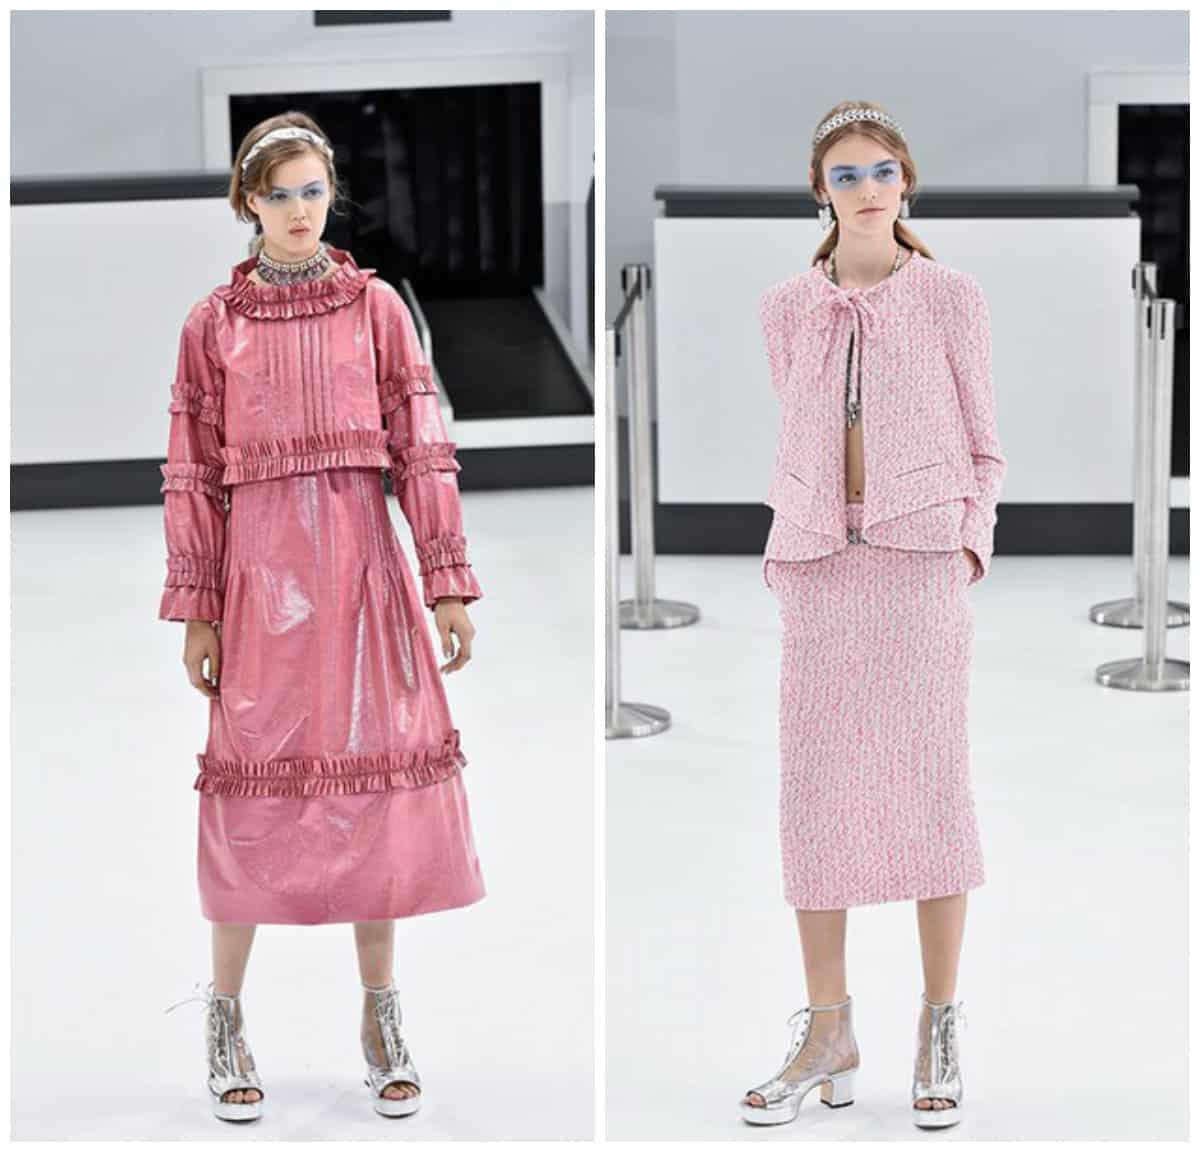 Paris-Fashion-Week-Chanel-show-Spring-Summer-2016-8